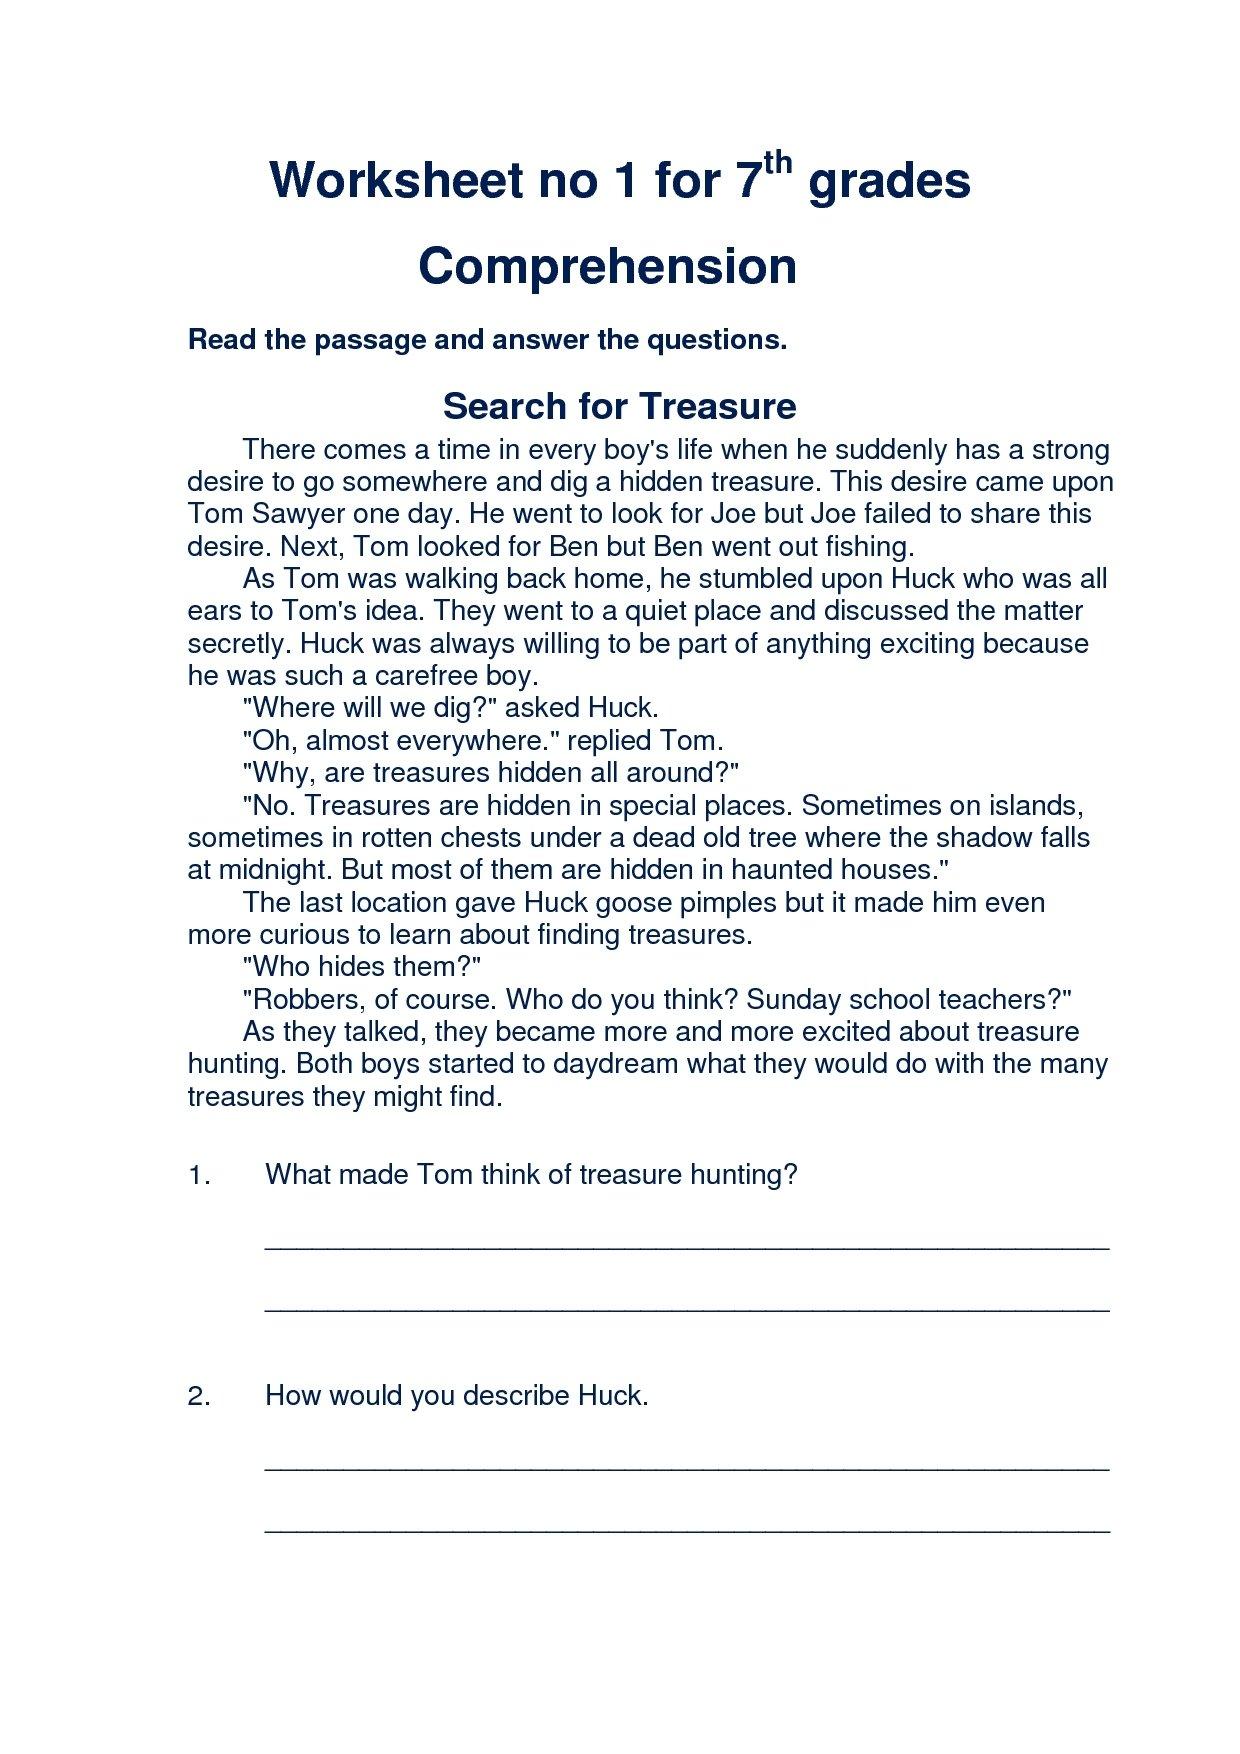 10 Beautiful Main Idea Worksheets 7Th Grade 7th grade language worksheets worksheets for all download and 2021